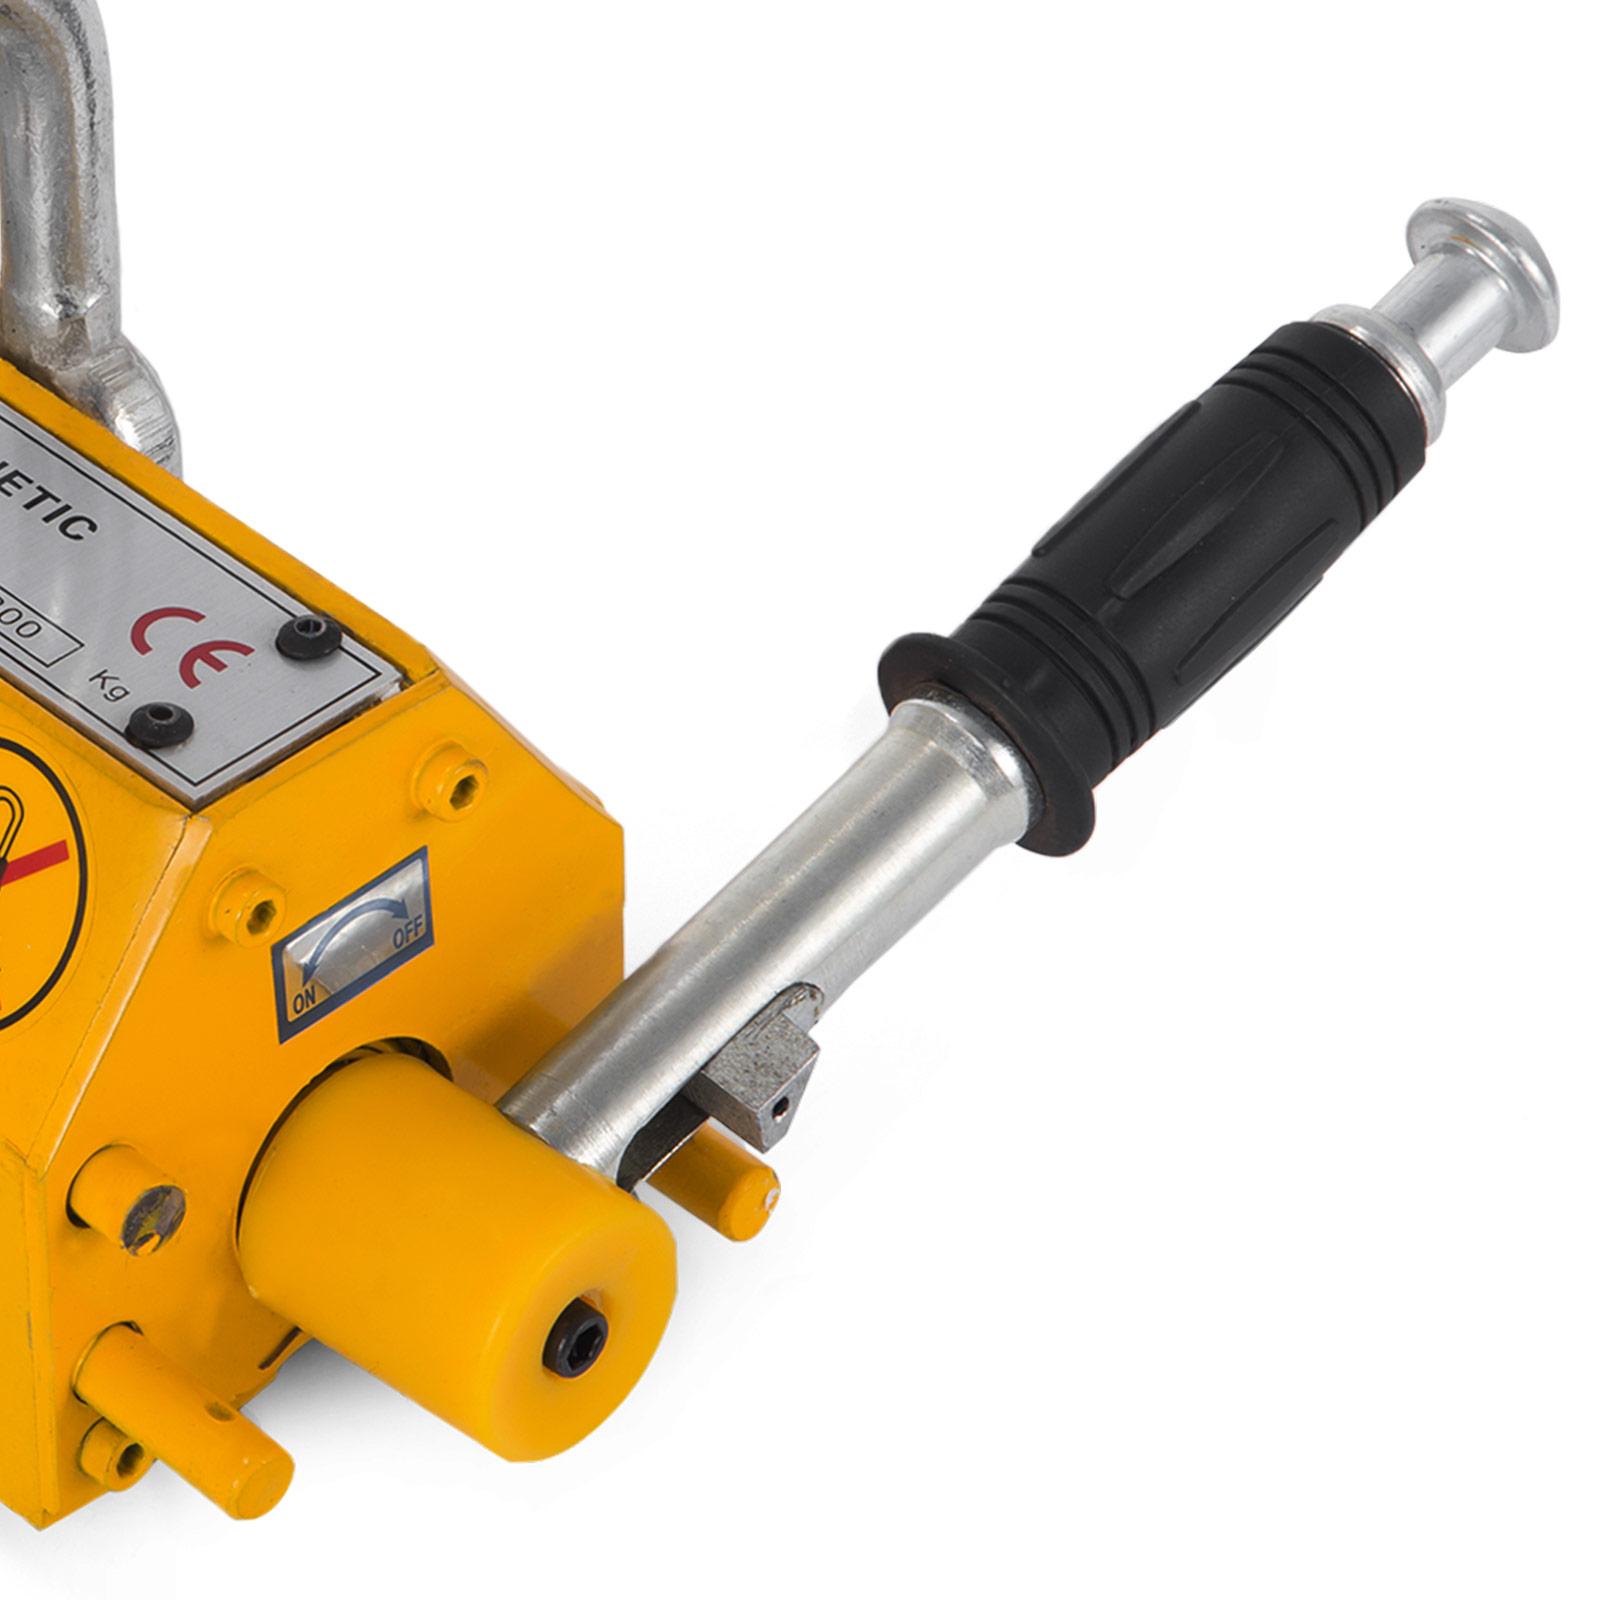 100-300-600-1000KG-Steel-Magnetic-Lifter-Heavy-Duty-Crane-Hoist-Lifting-Magnet miniature 36